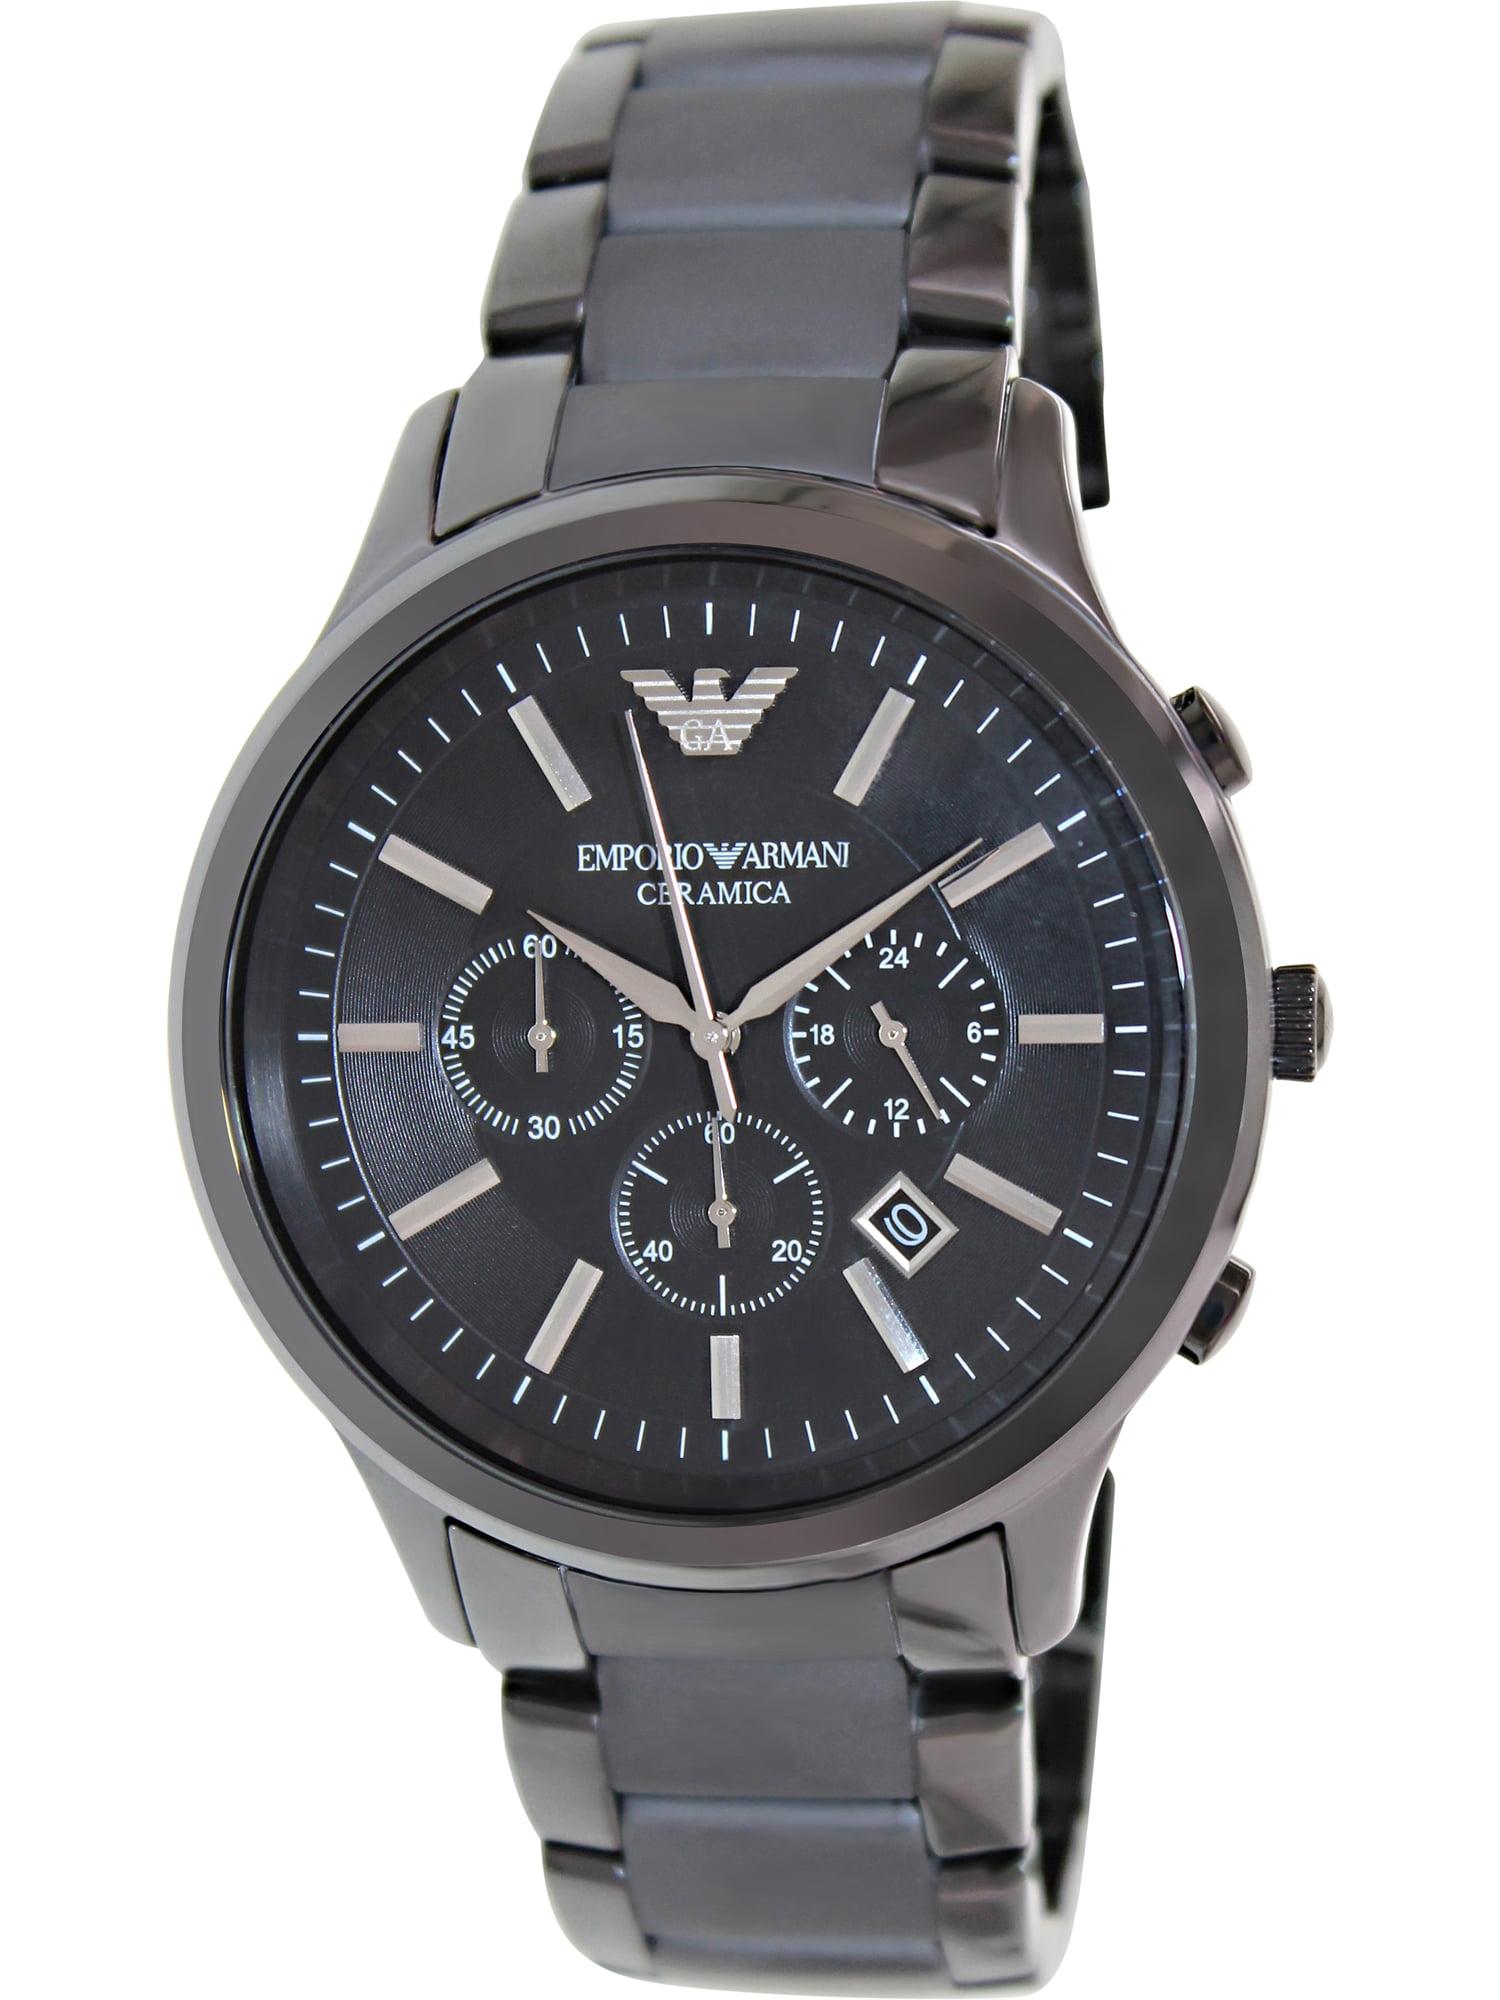 Emporio Armani Ceramic Men's Watch, AR1451